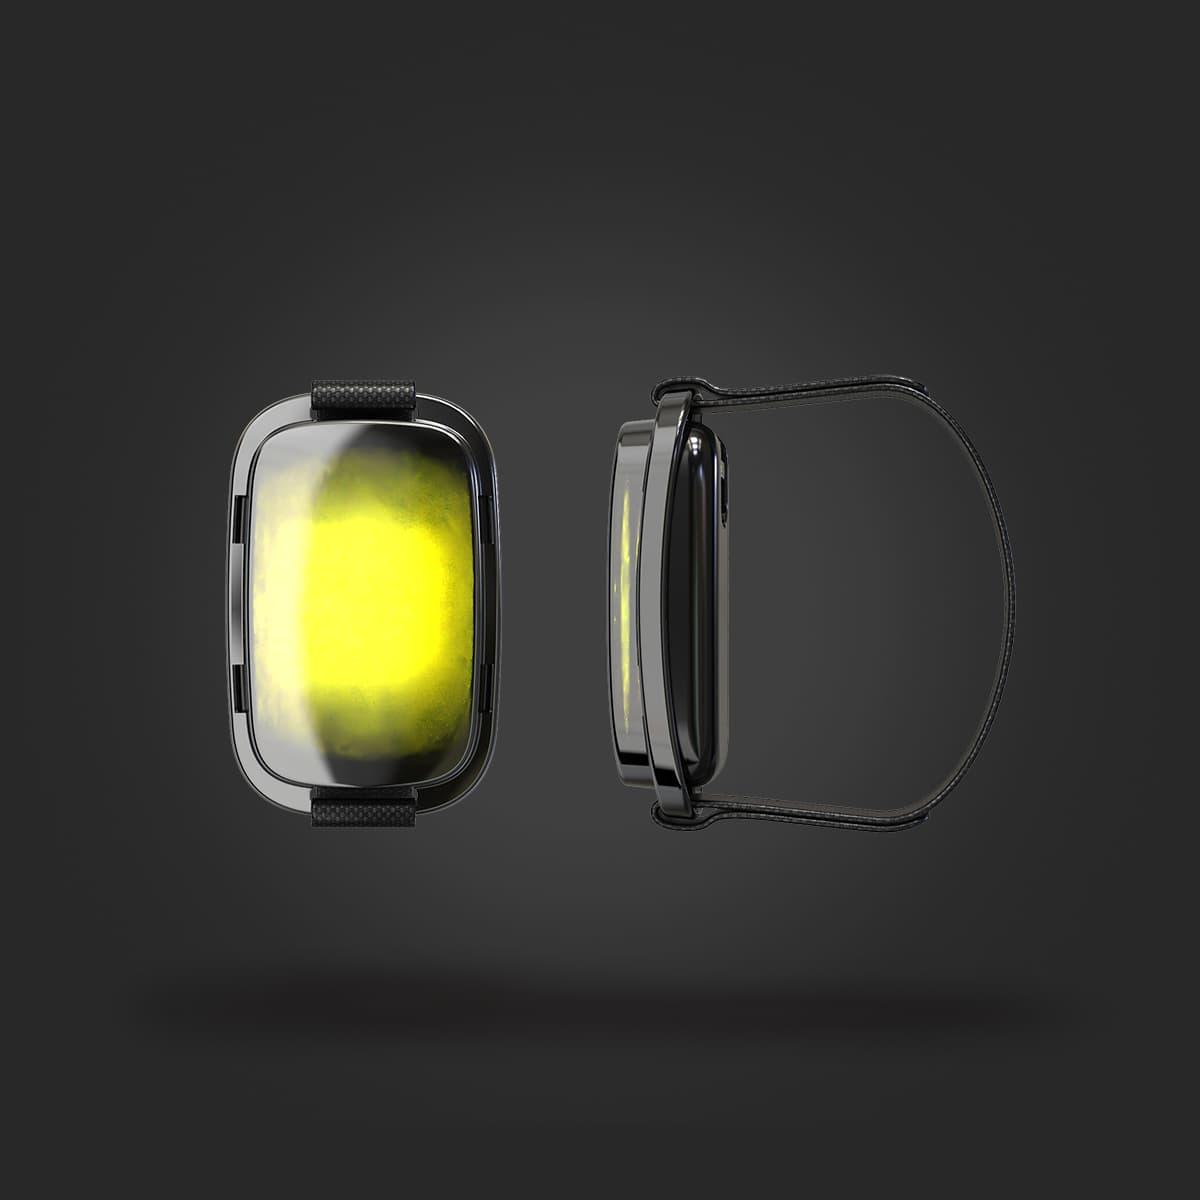 Radius wristband